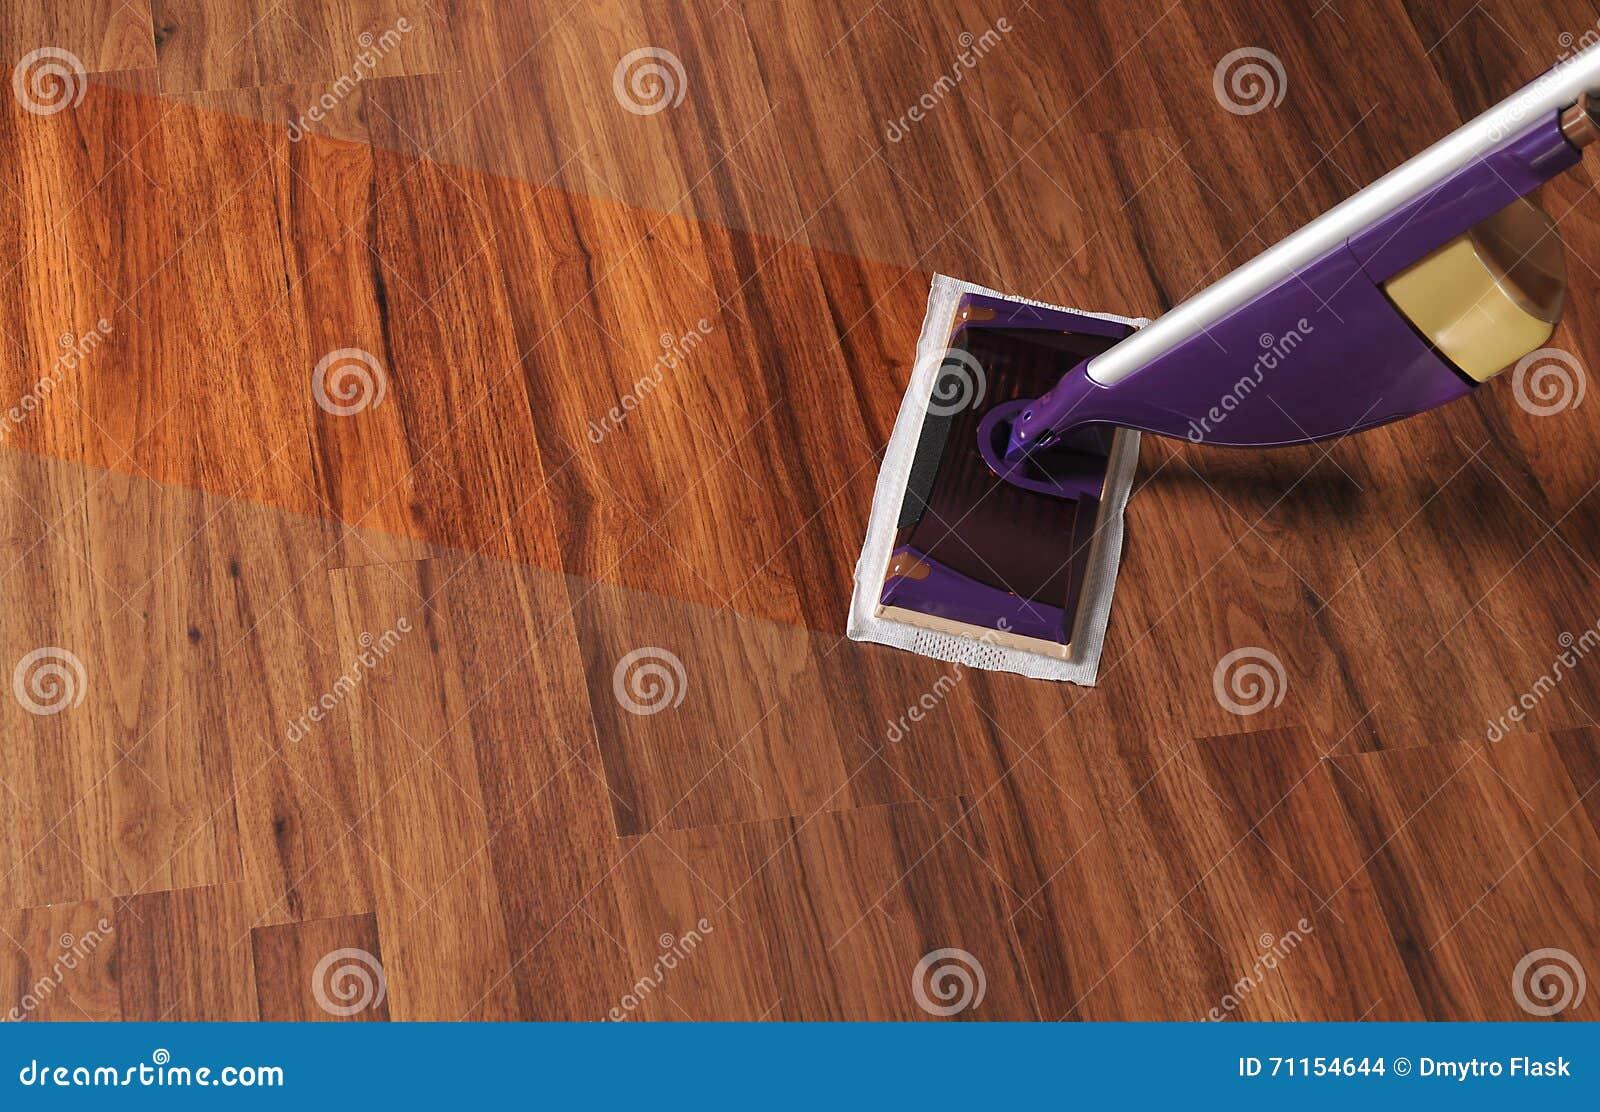 Como limpiar madera elegant cmo limpiar muebles de madera - Limpiar muebles madera ...